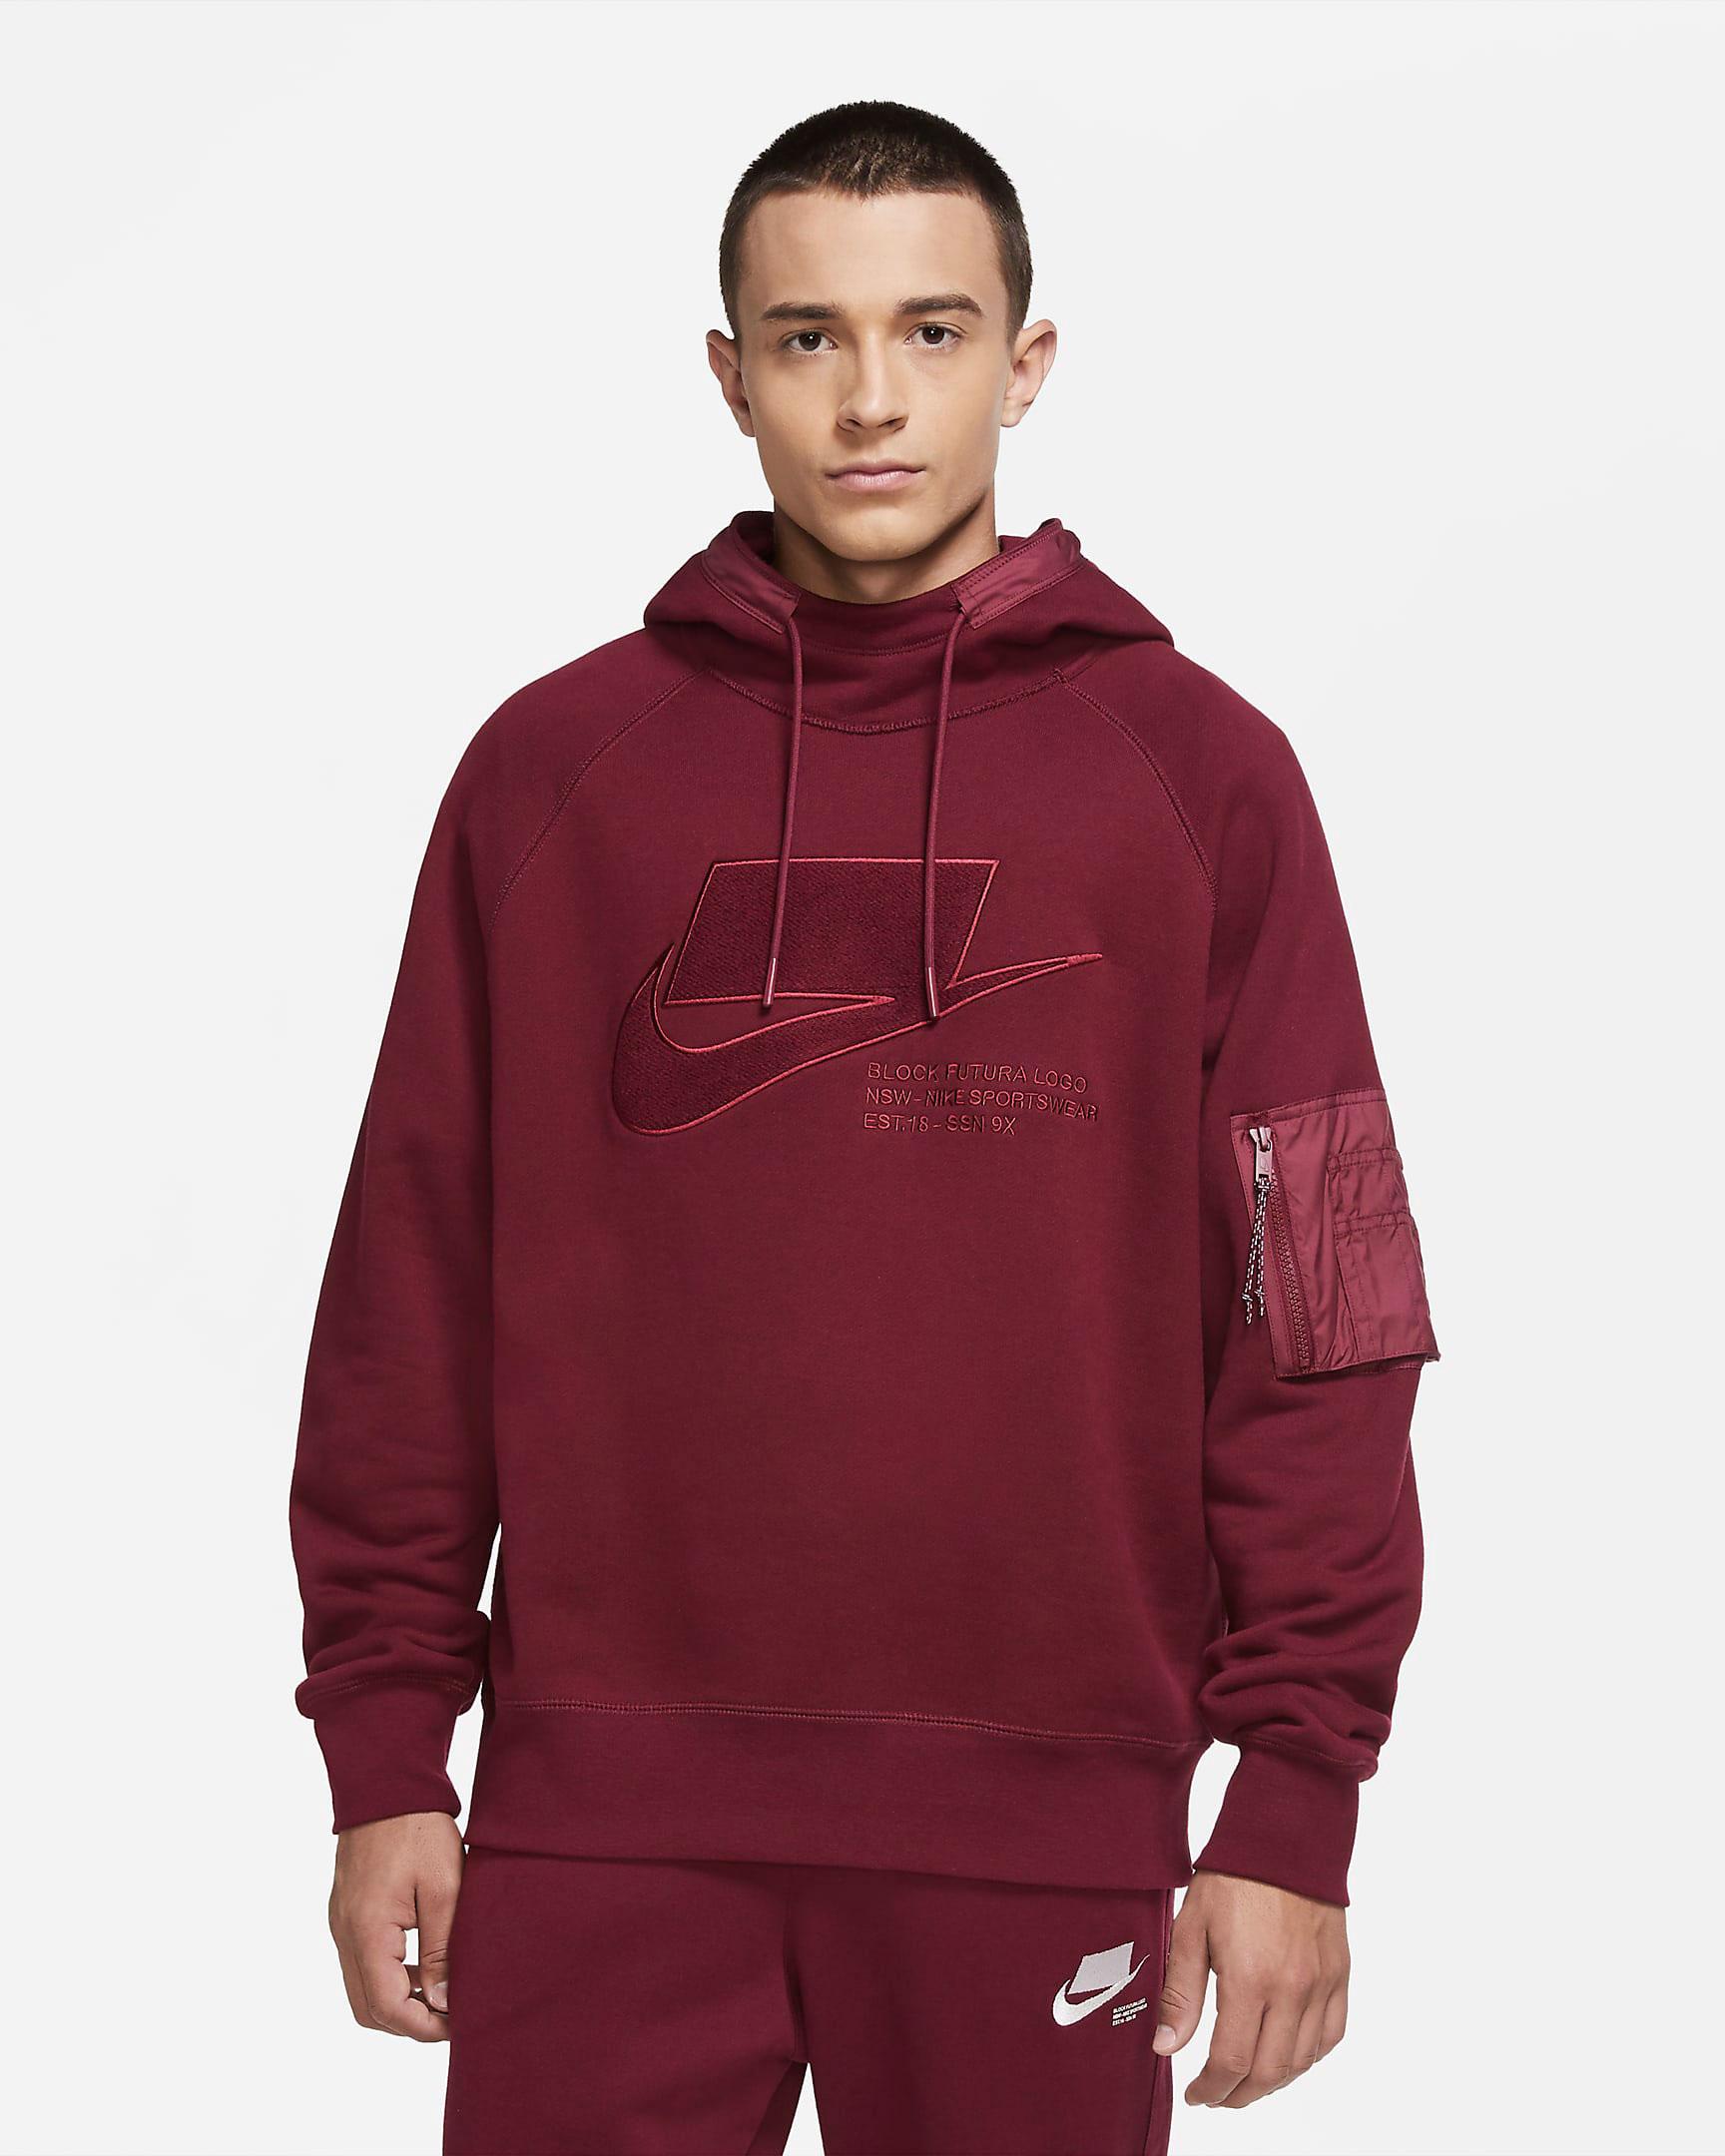 nike-sportswear-hoodie-beetroot-bordeaux